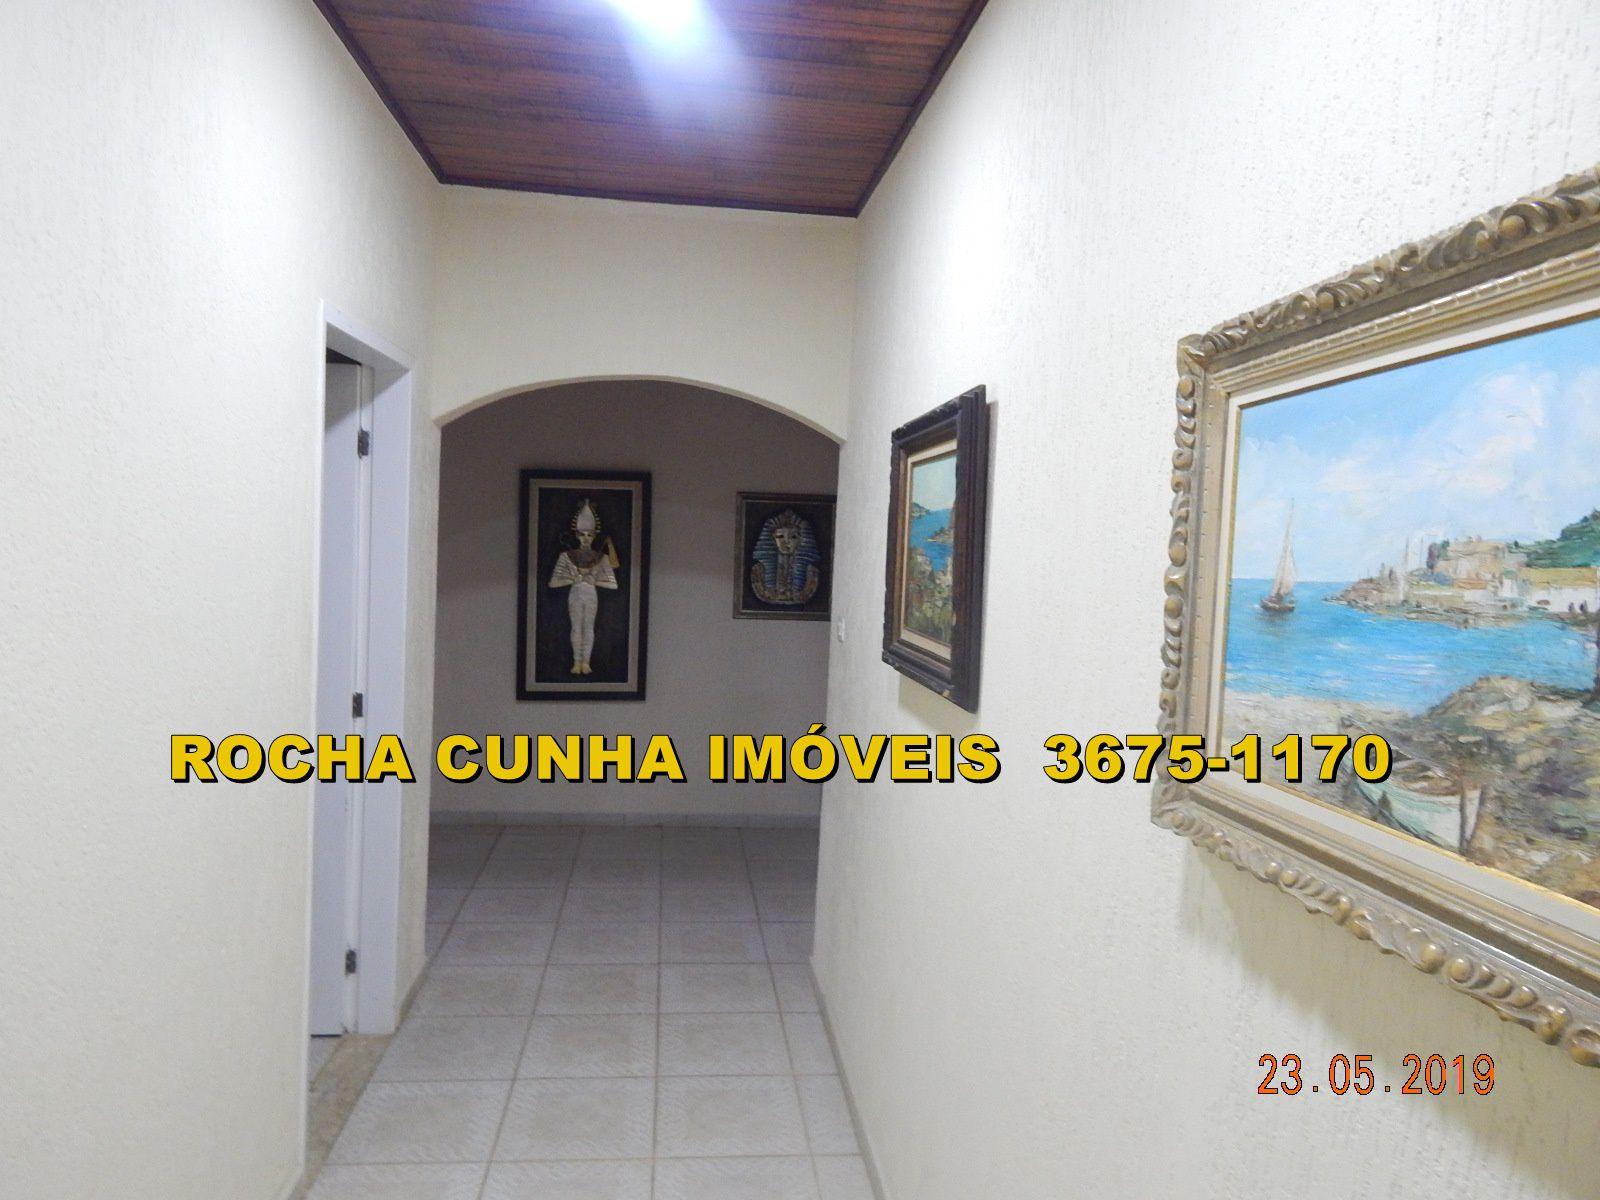 Chácara à venda Santana de Parnaíba,SP - R$ 780.000 - CHACARA0010 - 20